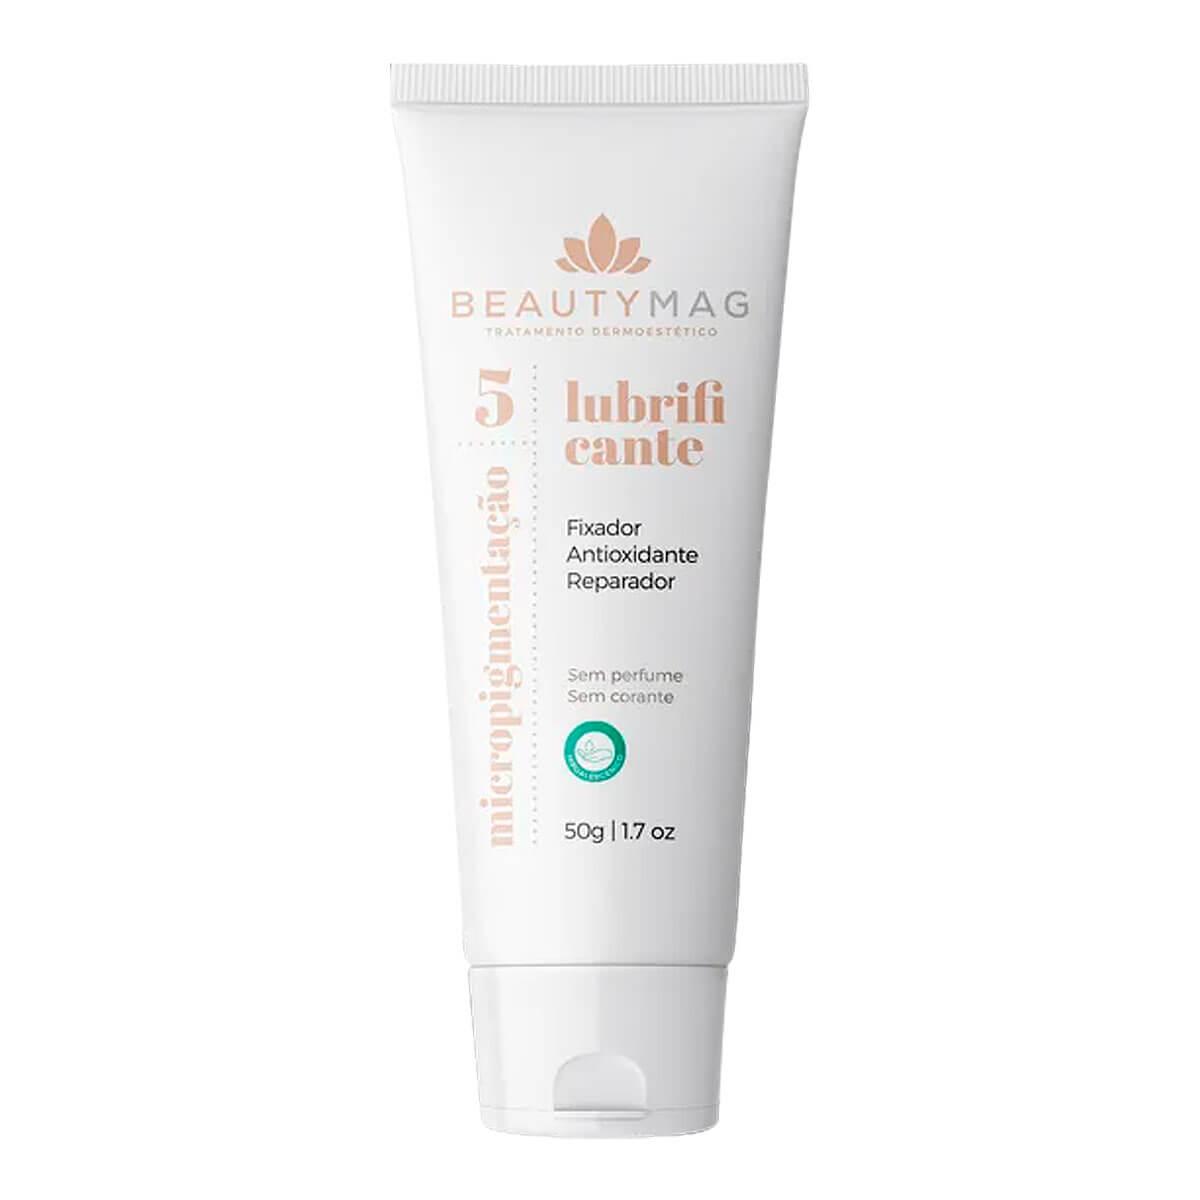 Lubrificante Beauty Mag para Micropigmento 50g